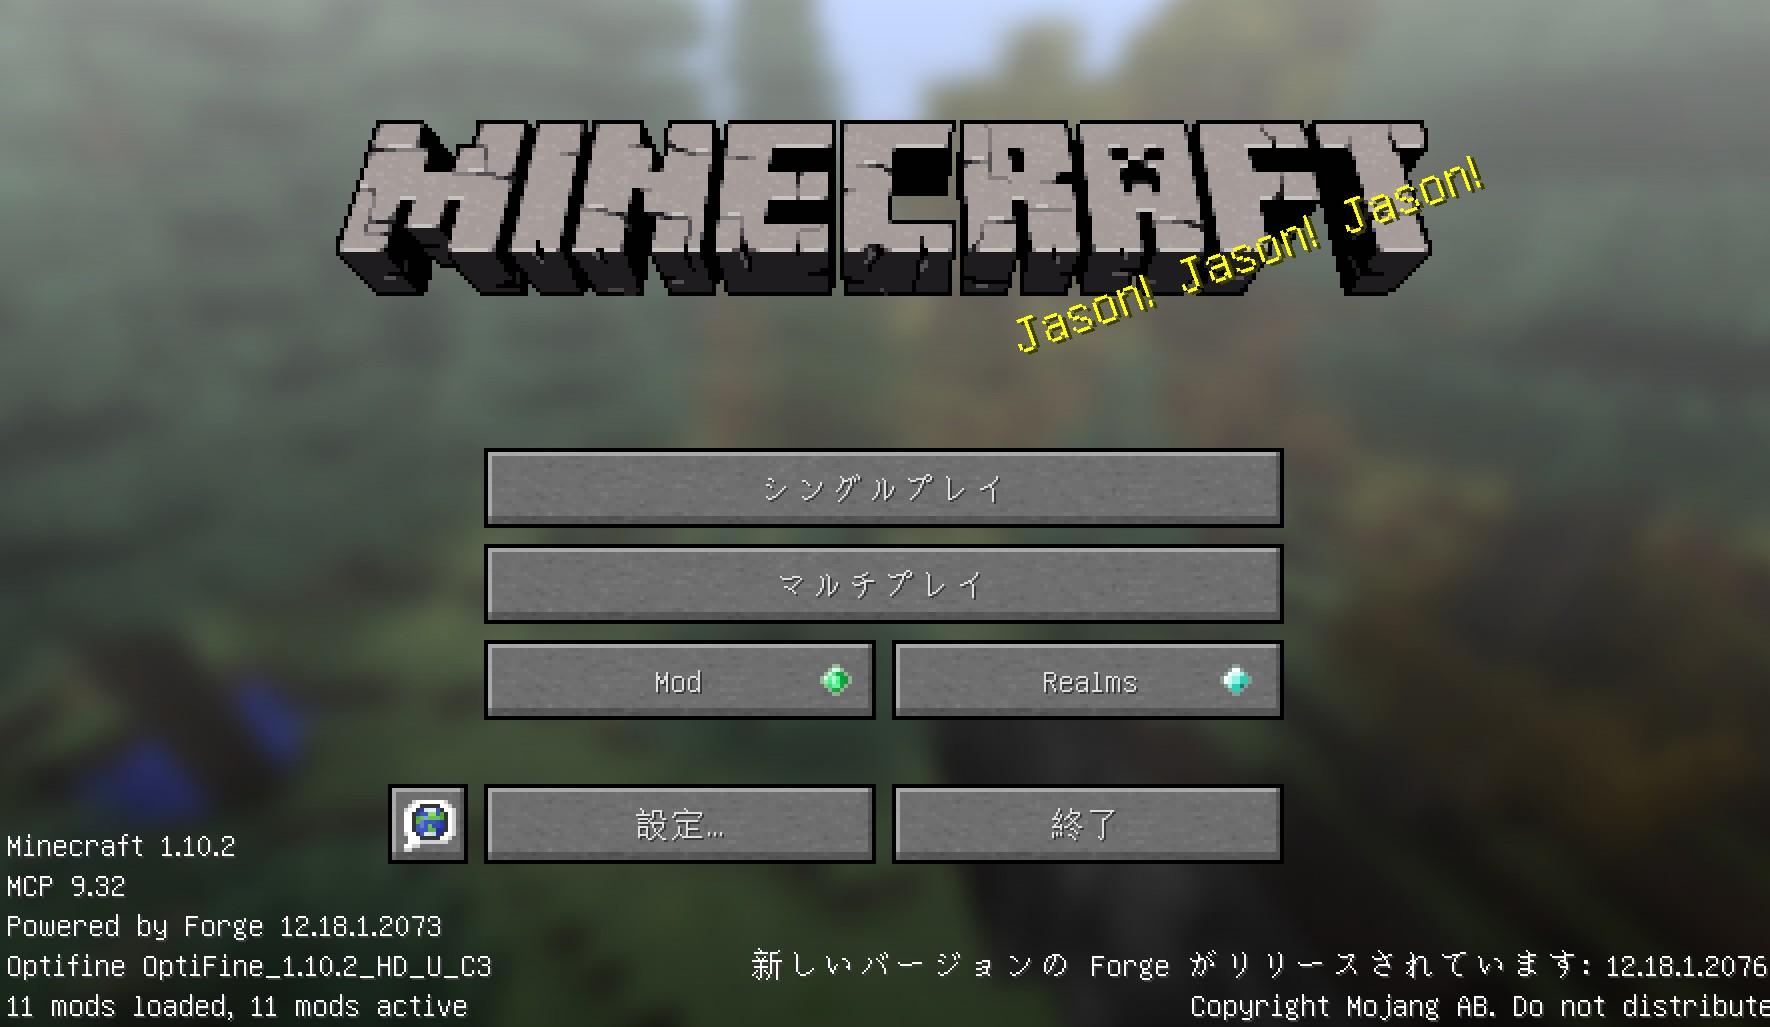 minecraft_047.jpg